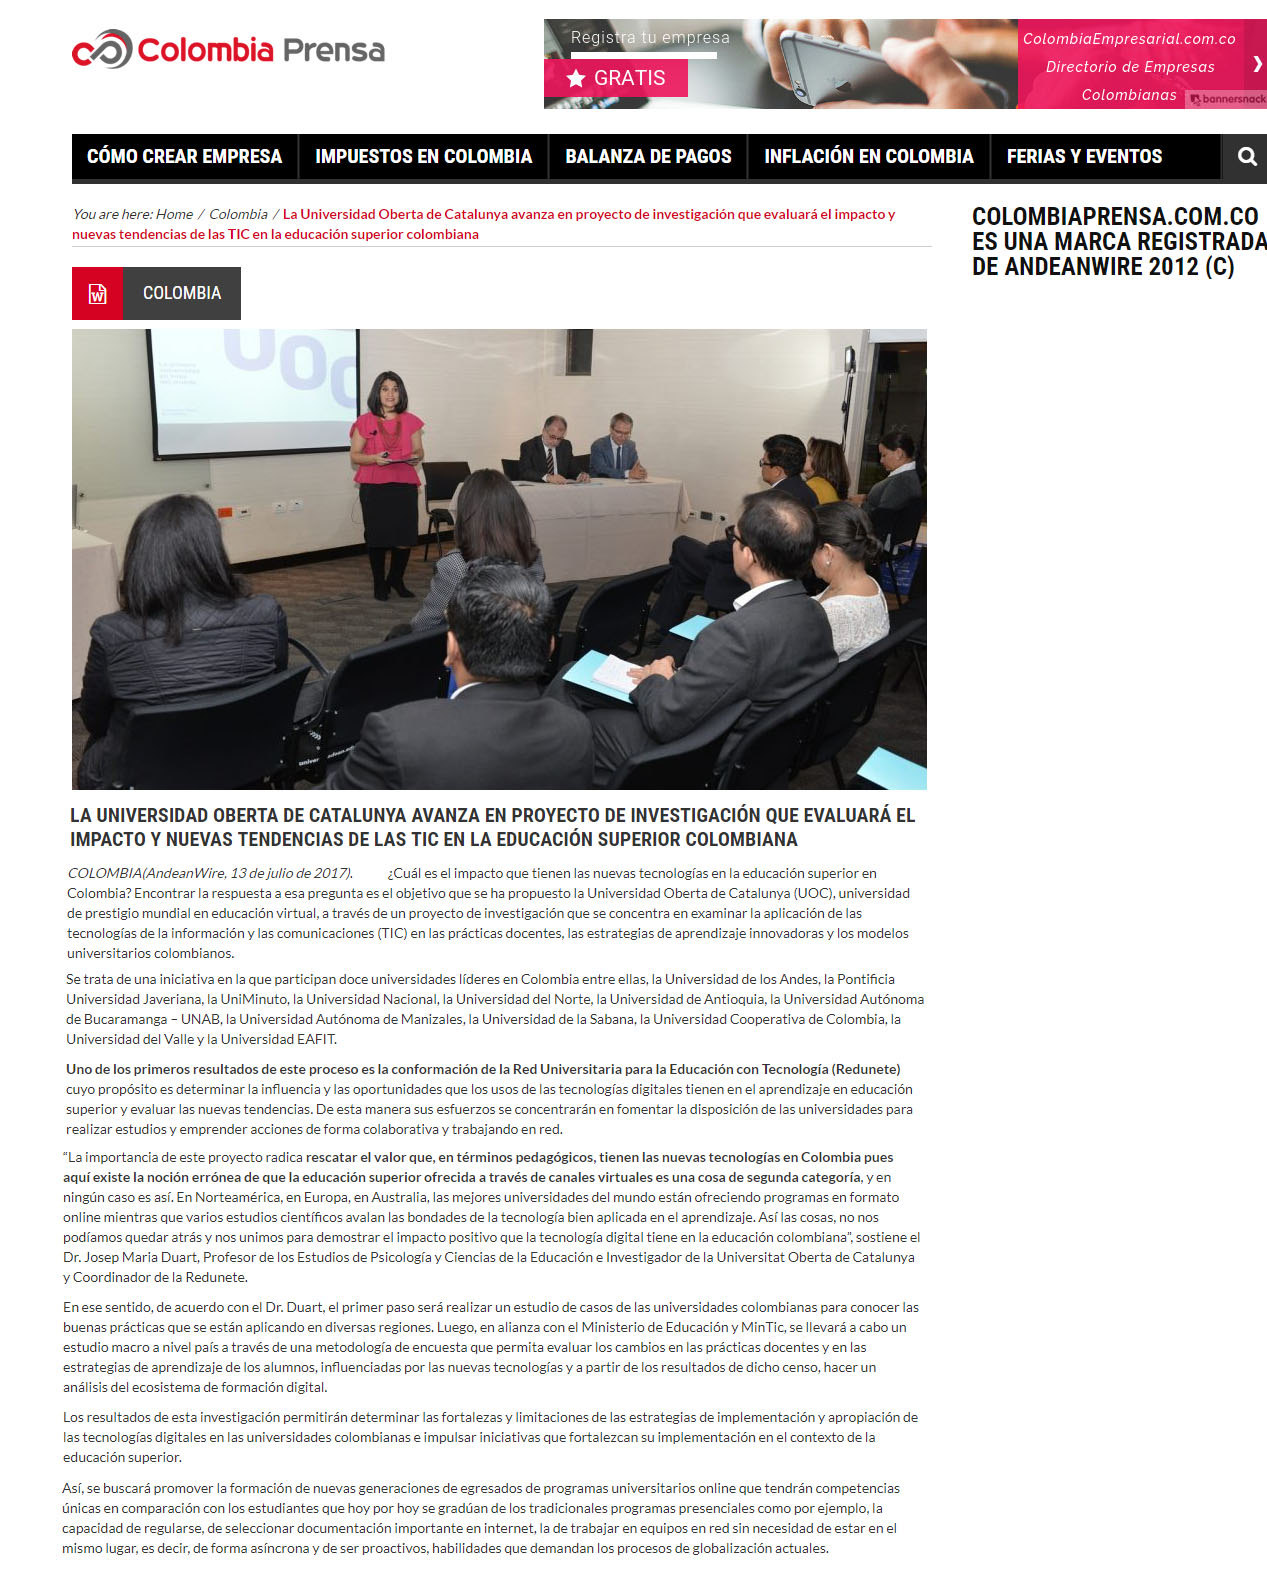 www.colombiaprensa.com.co 14 de julio 2017